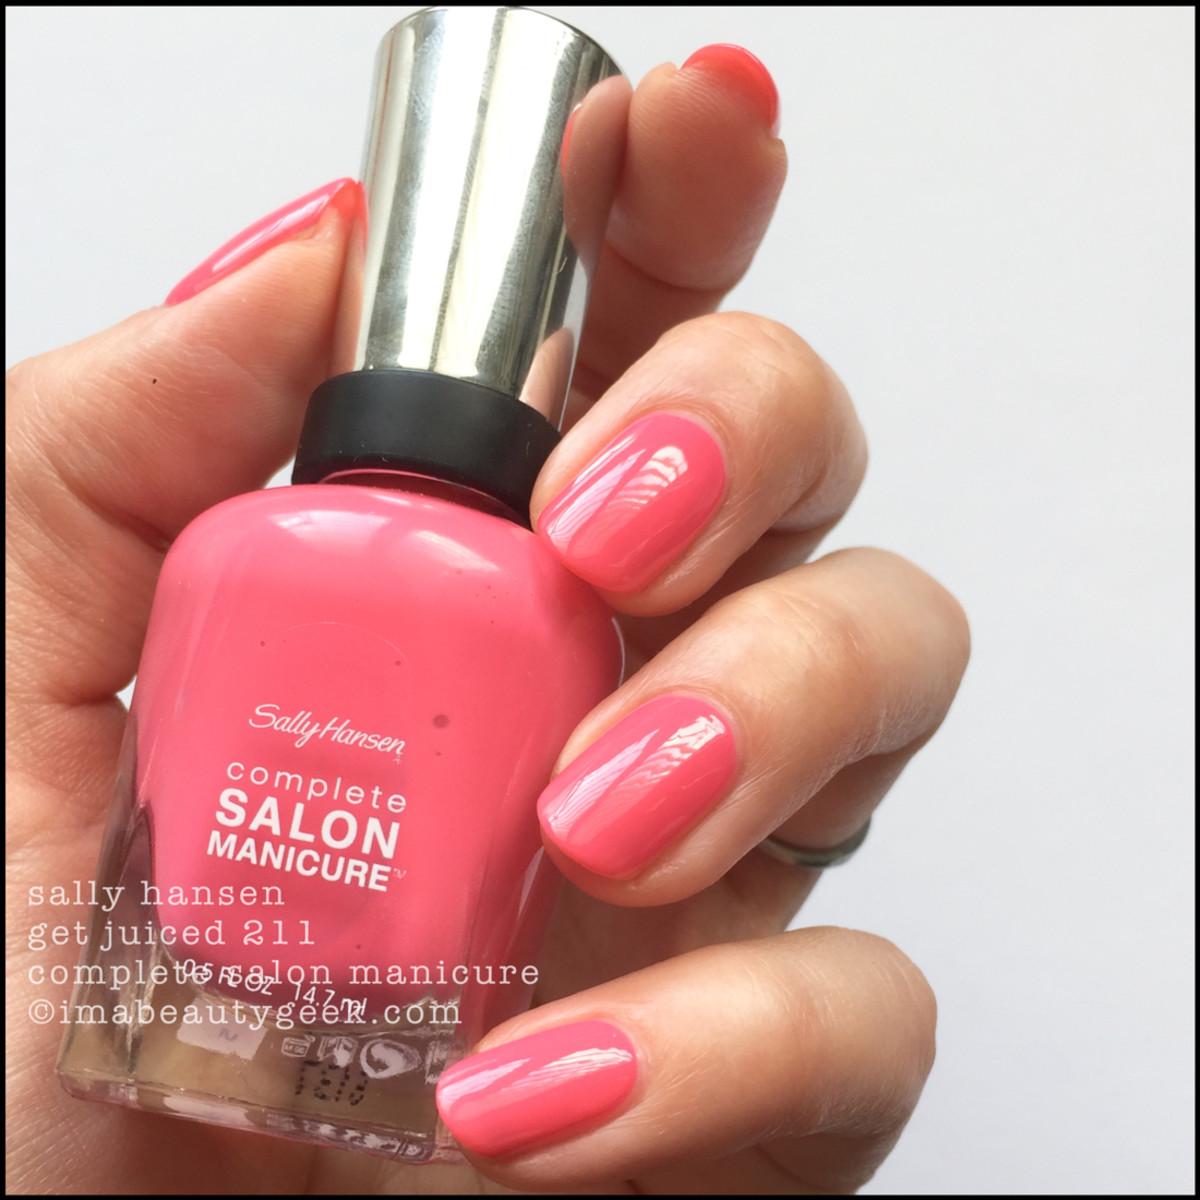 Sally Hansen Summer 2017 Complete Salon Manicure Swatches Giveaway Beautygeeks